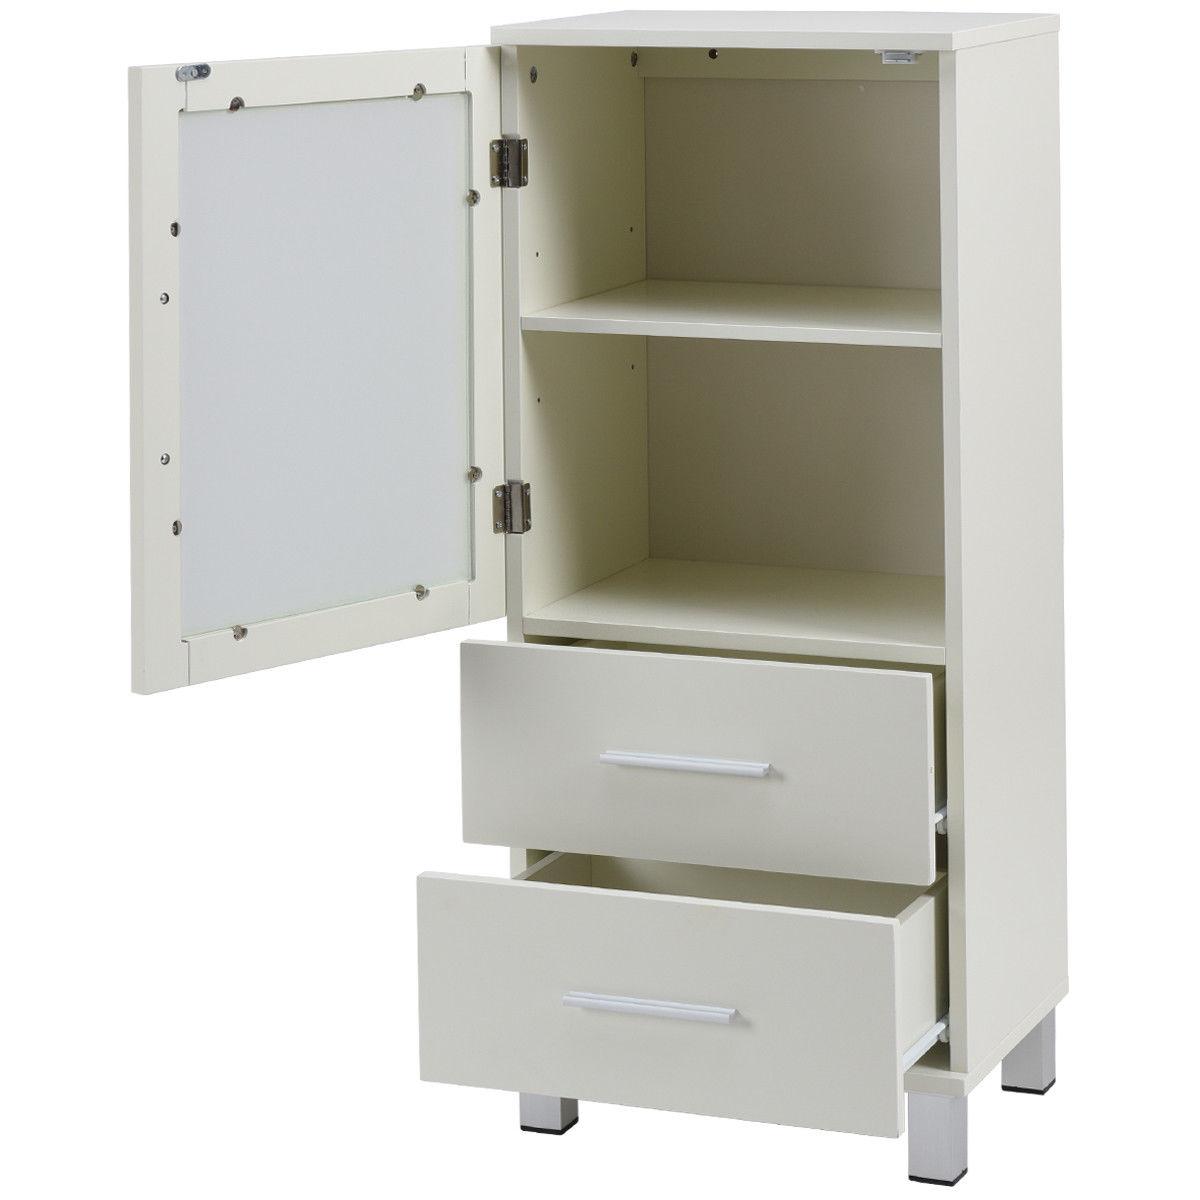 Wood Floor Storage Cabinet w/ 2 Drawers